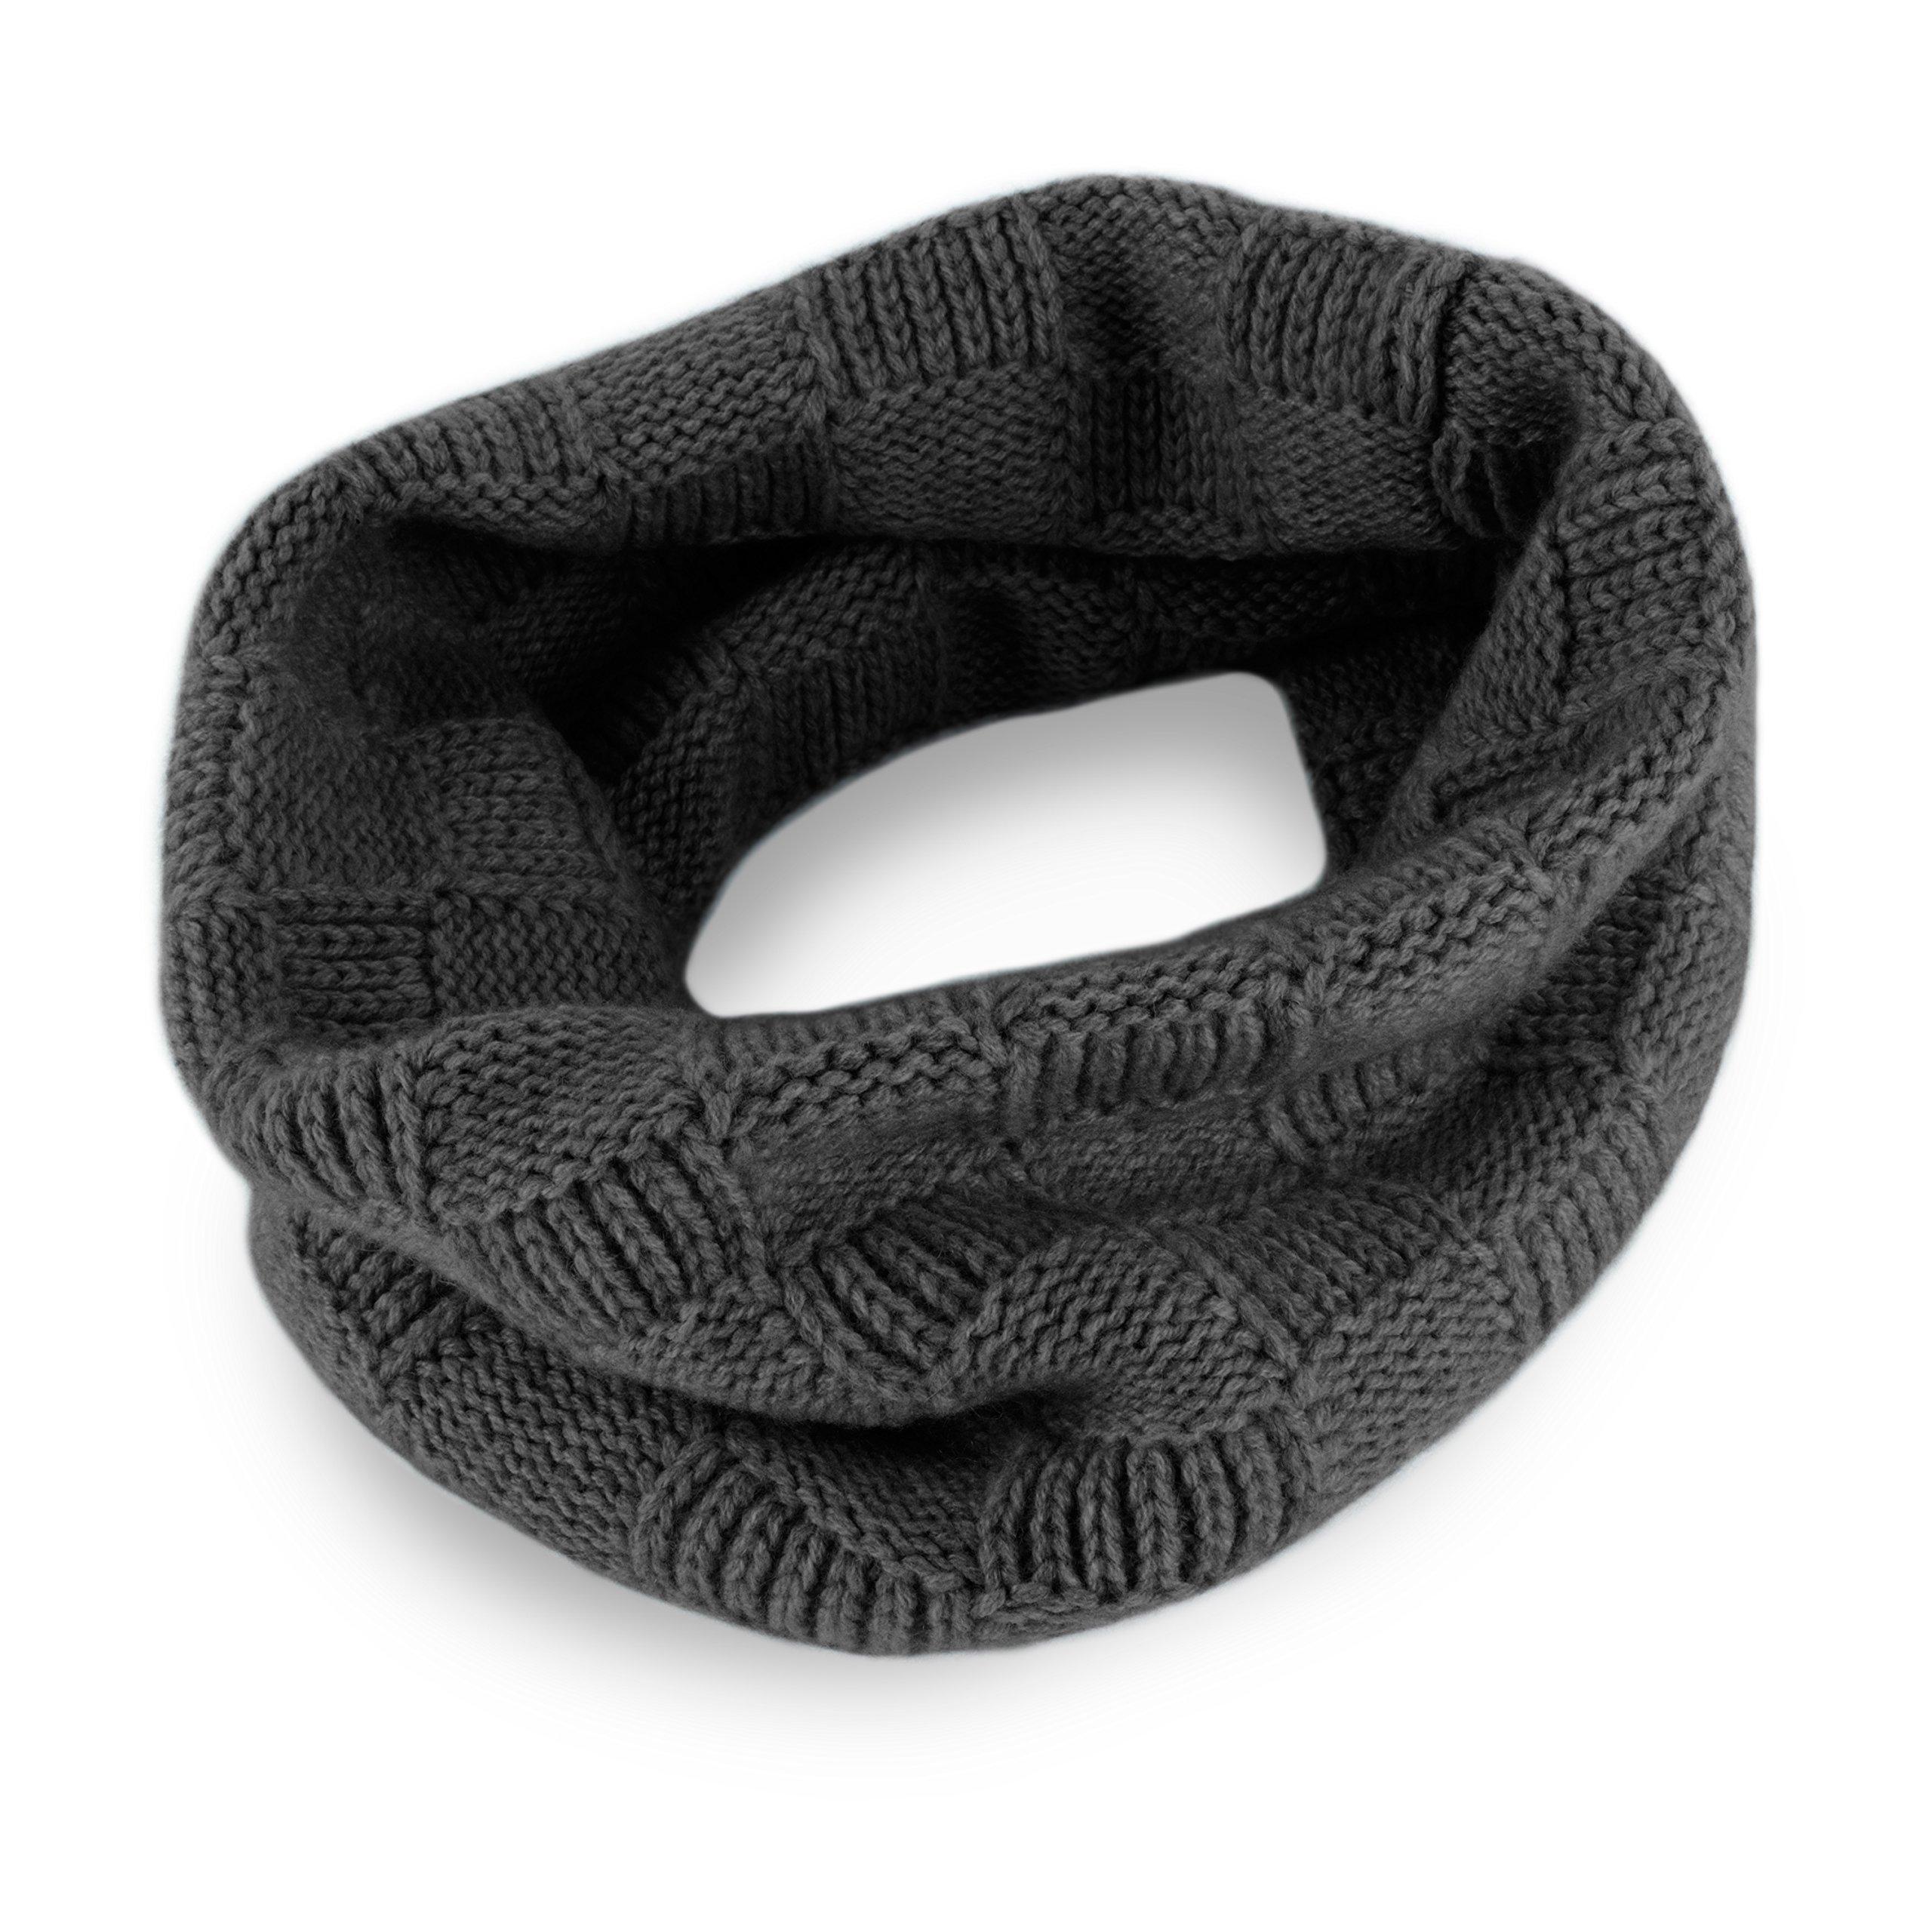 Love Cashmere Mens Checked 100% Cashmere Snood - Dark Gray - made in Scotland - RRP $160